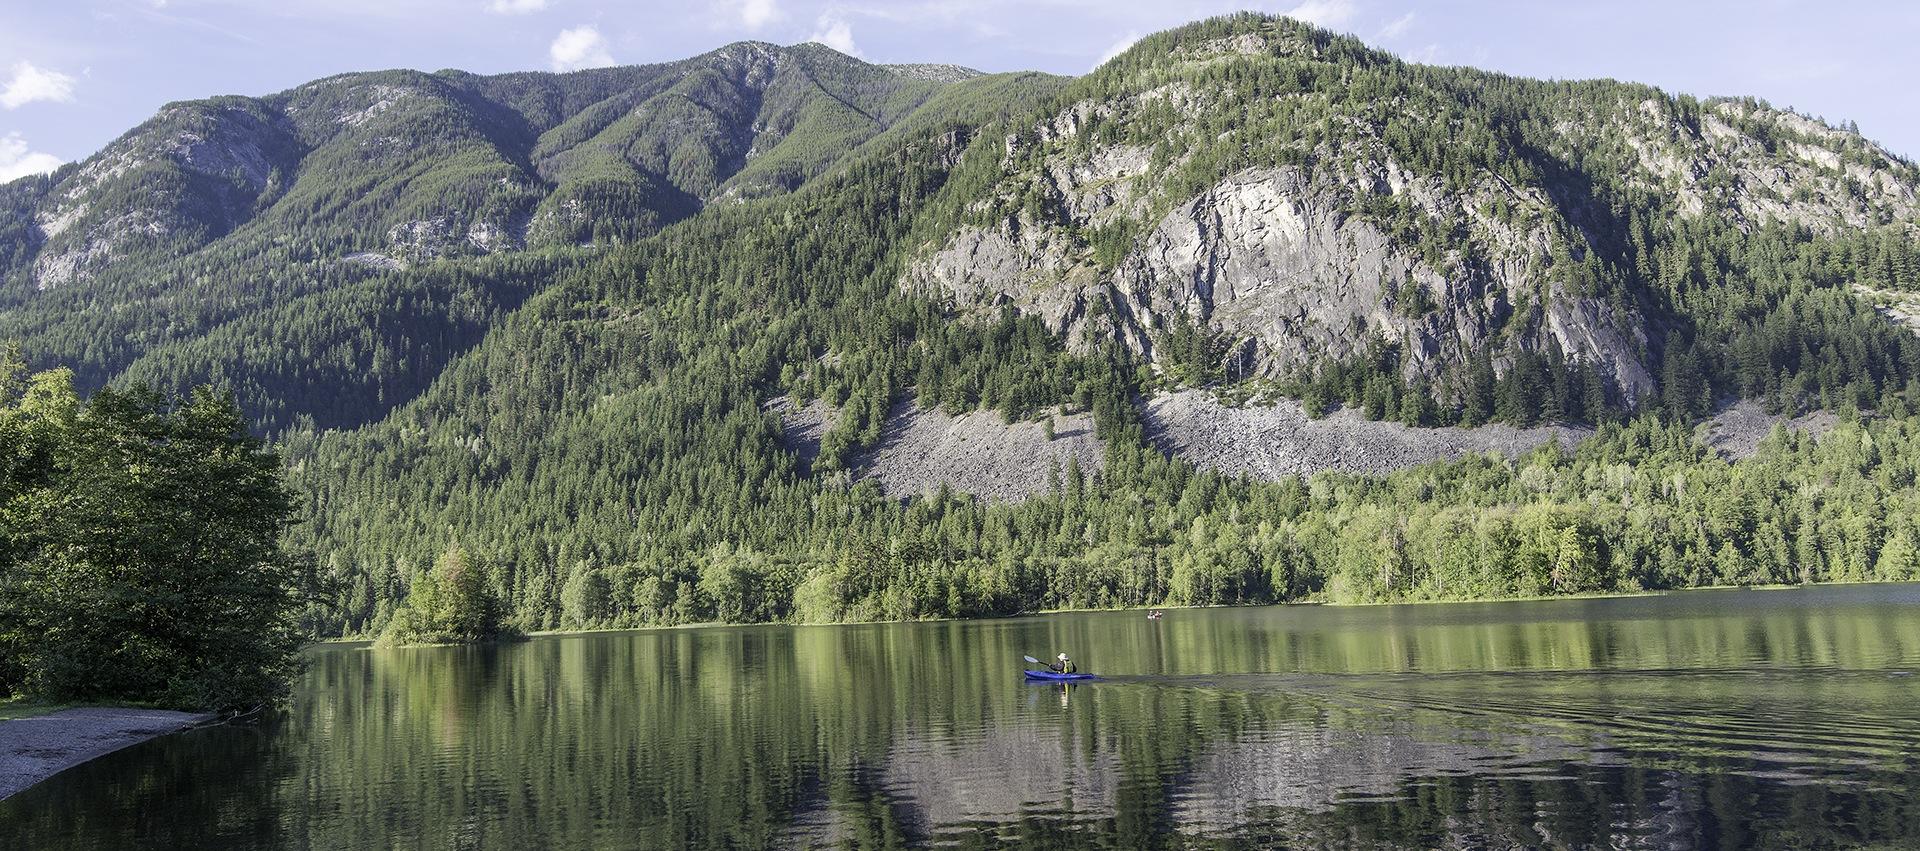 summit lake provincial park